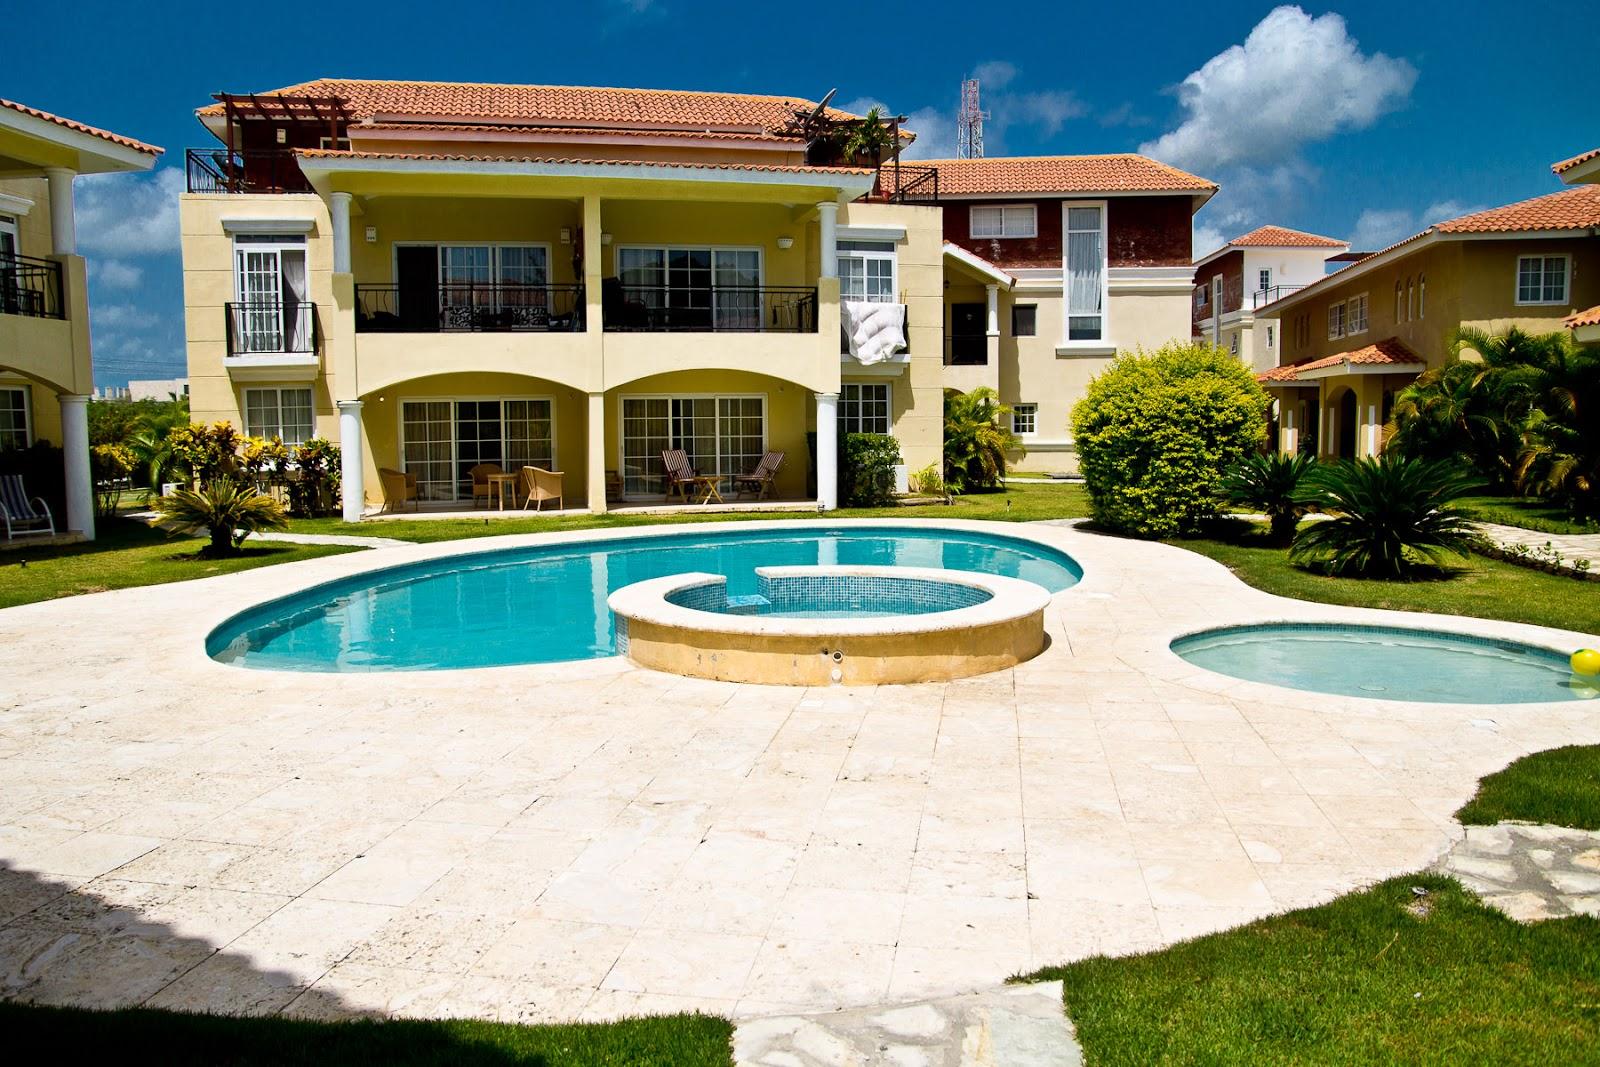 Punta cana real estate in dominican republic for Homes for sale dominican republic punta cana